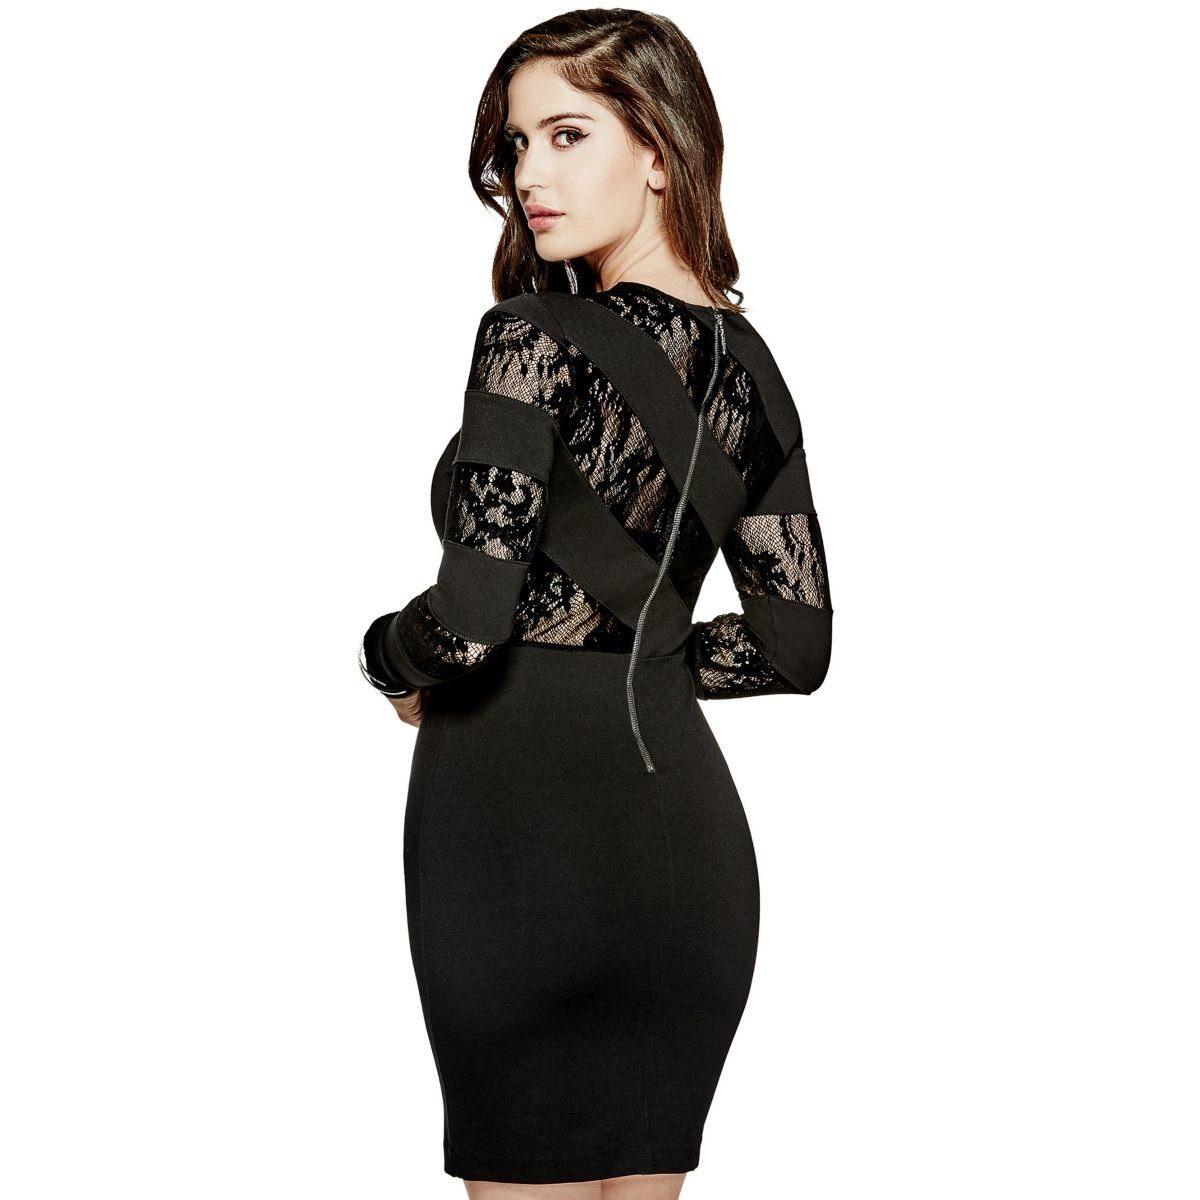 8 Perfekt Guess Abend Kleider Stylish - Abendkleid